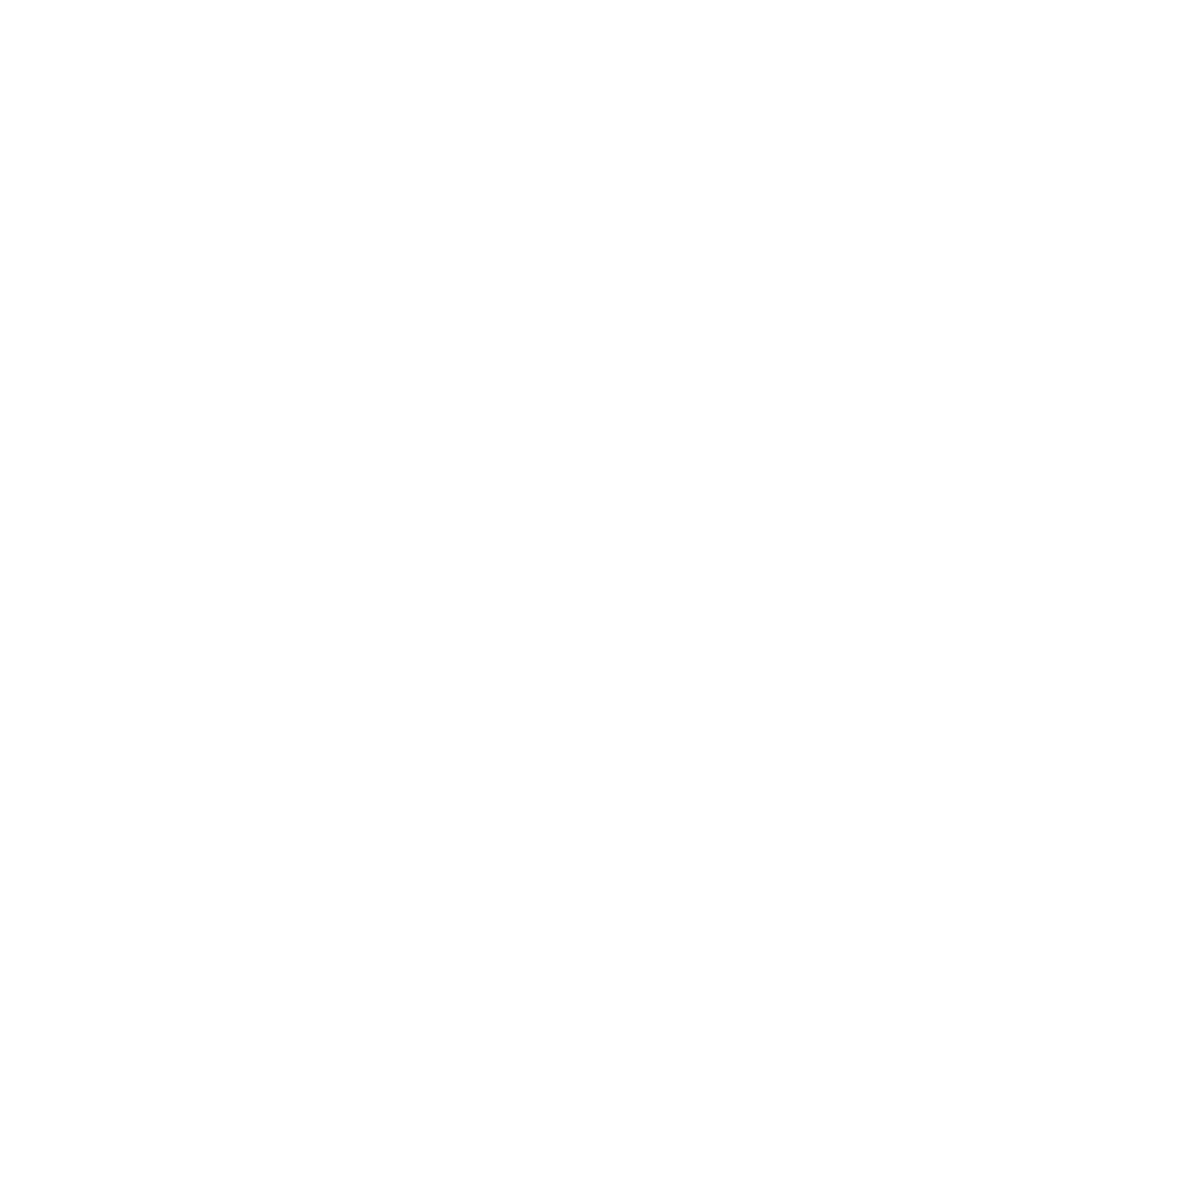 Ideas that impact